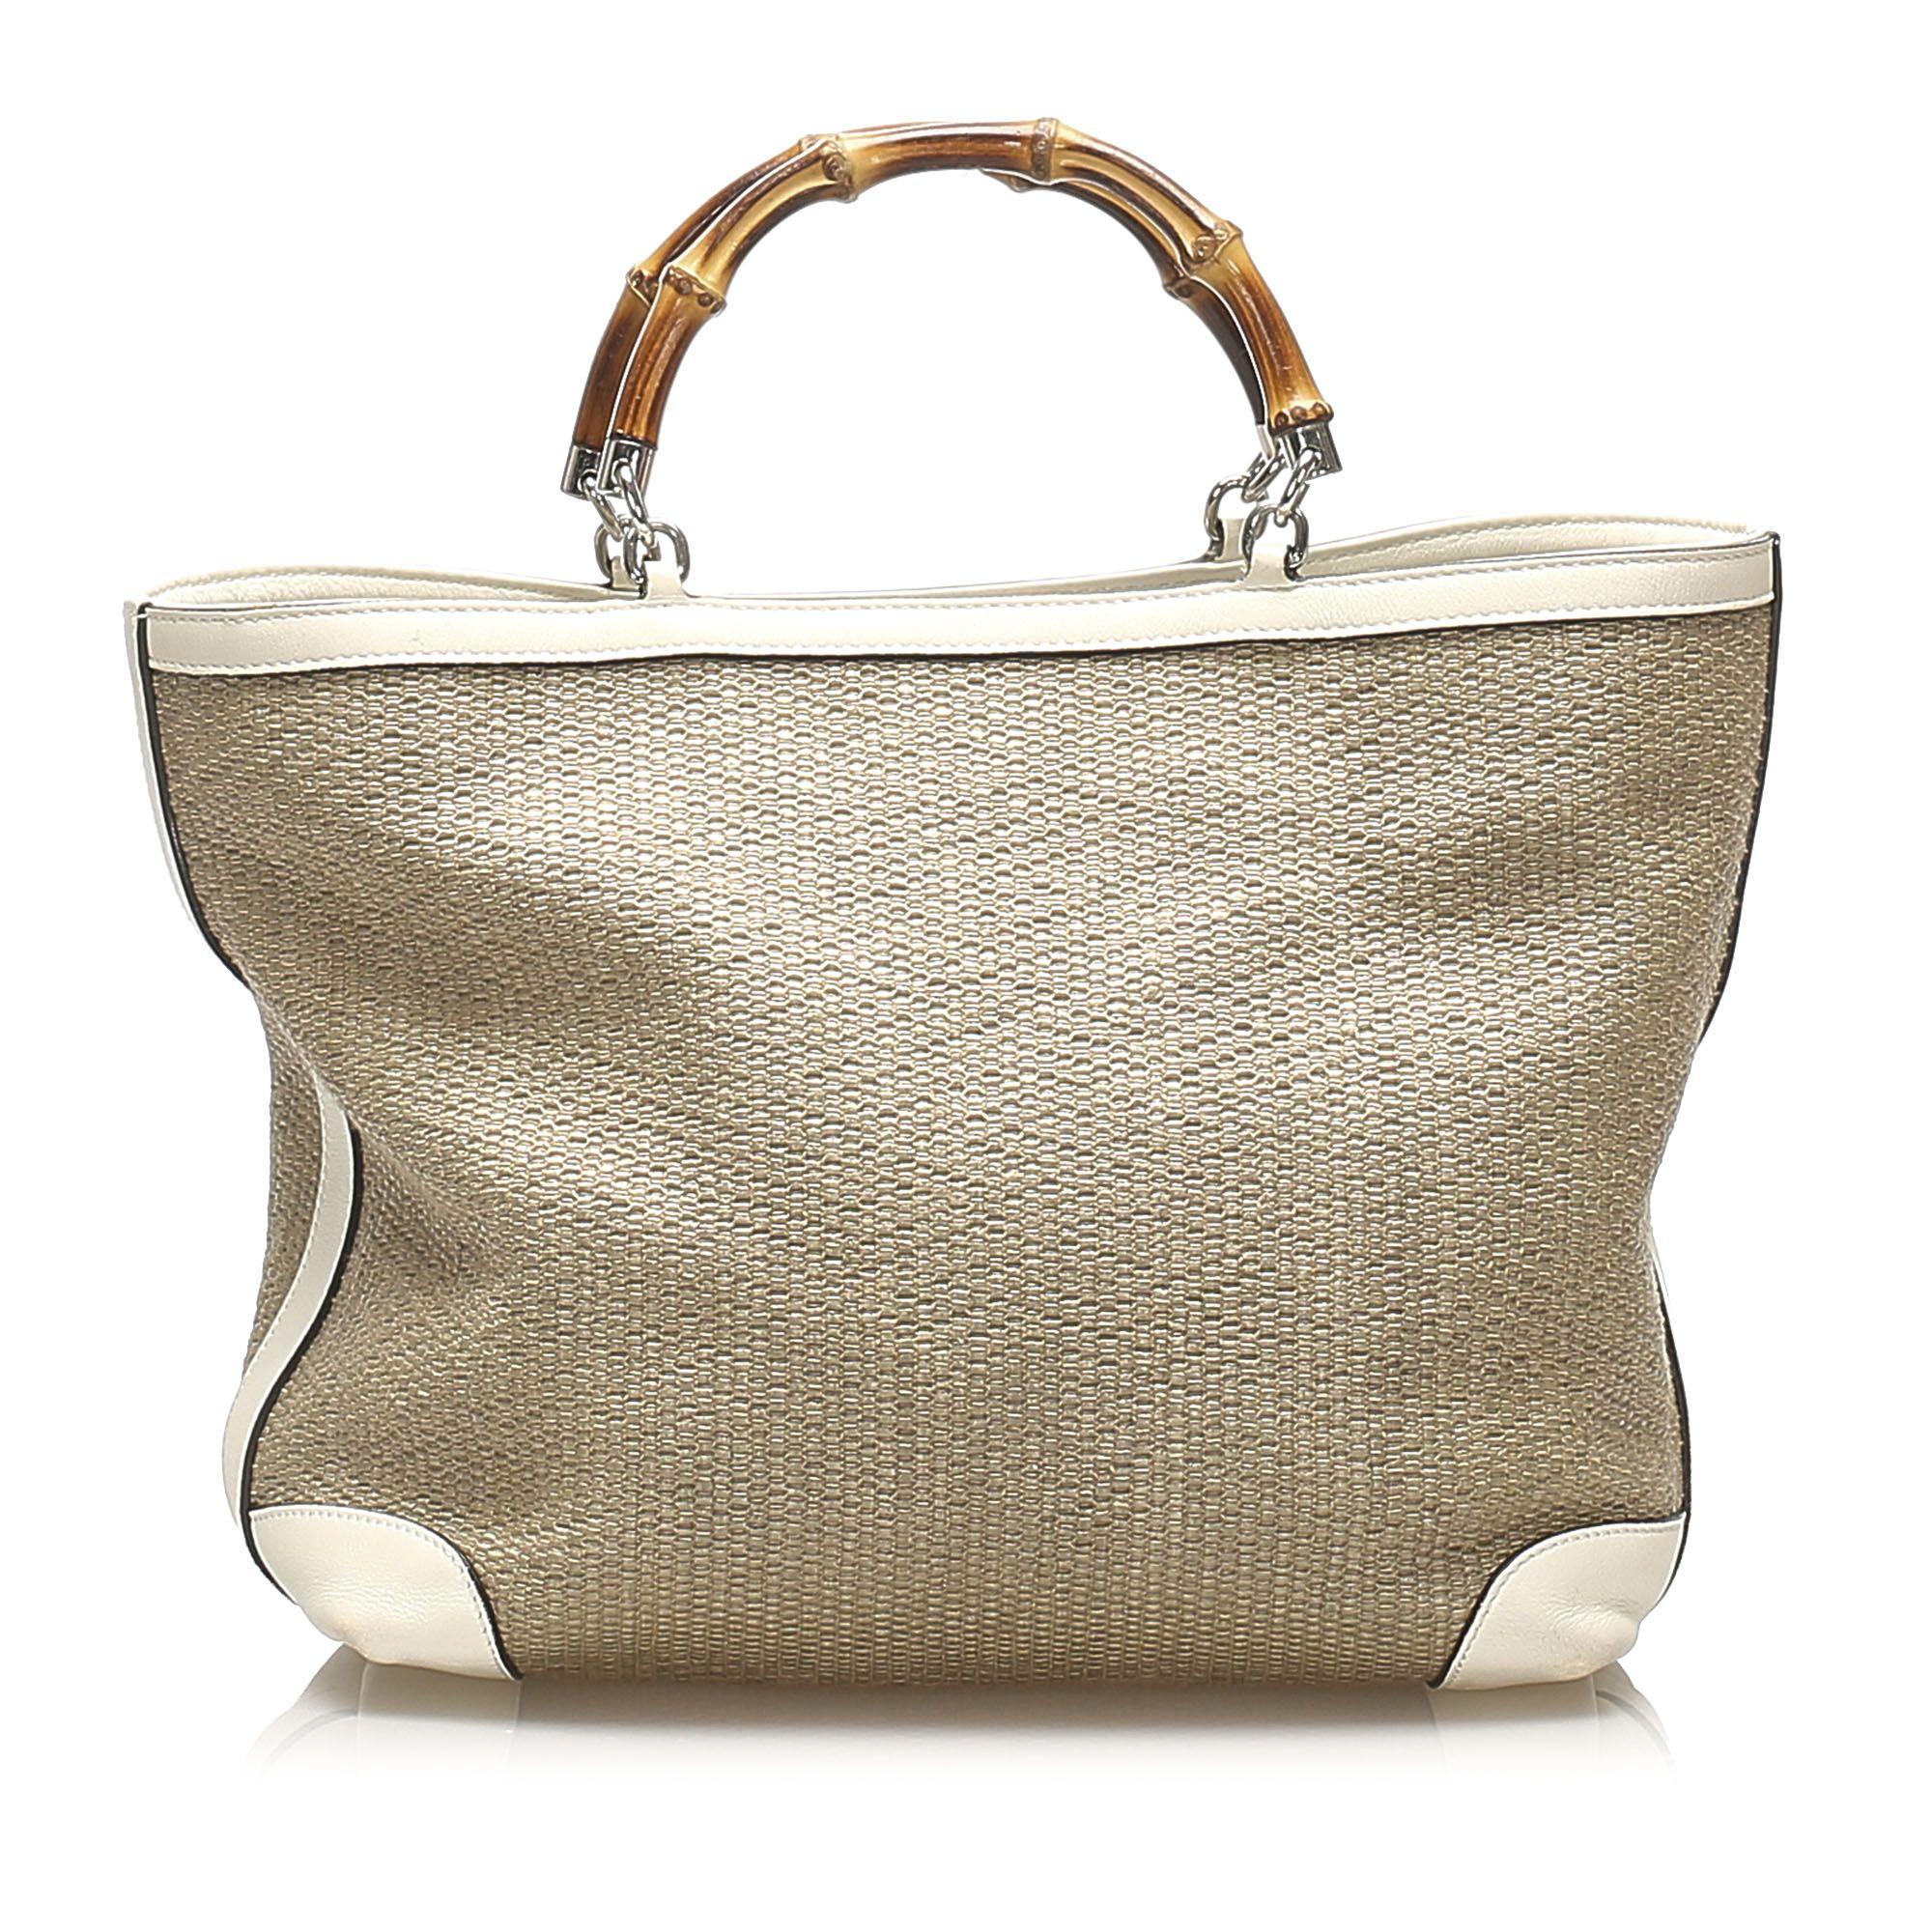 Vintage Gucci Bamboo Raffia Handbag Brown